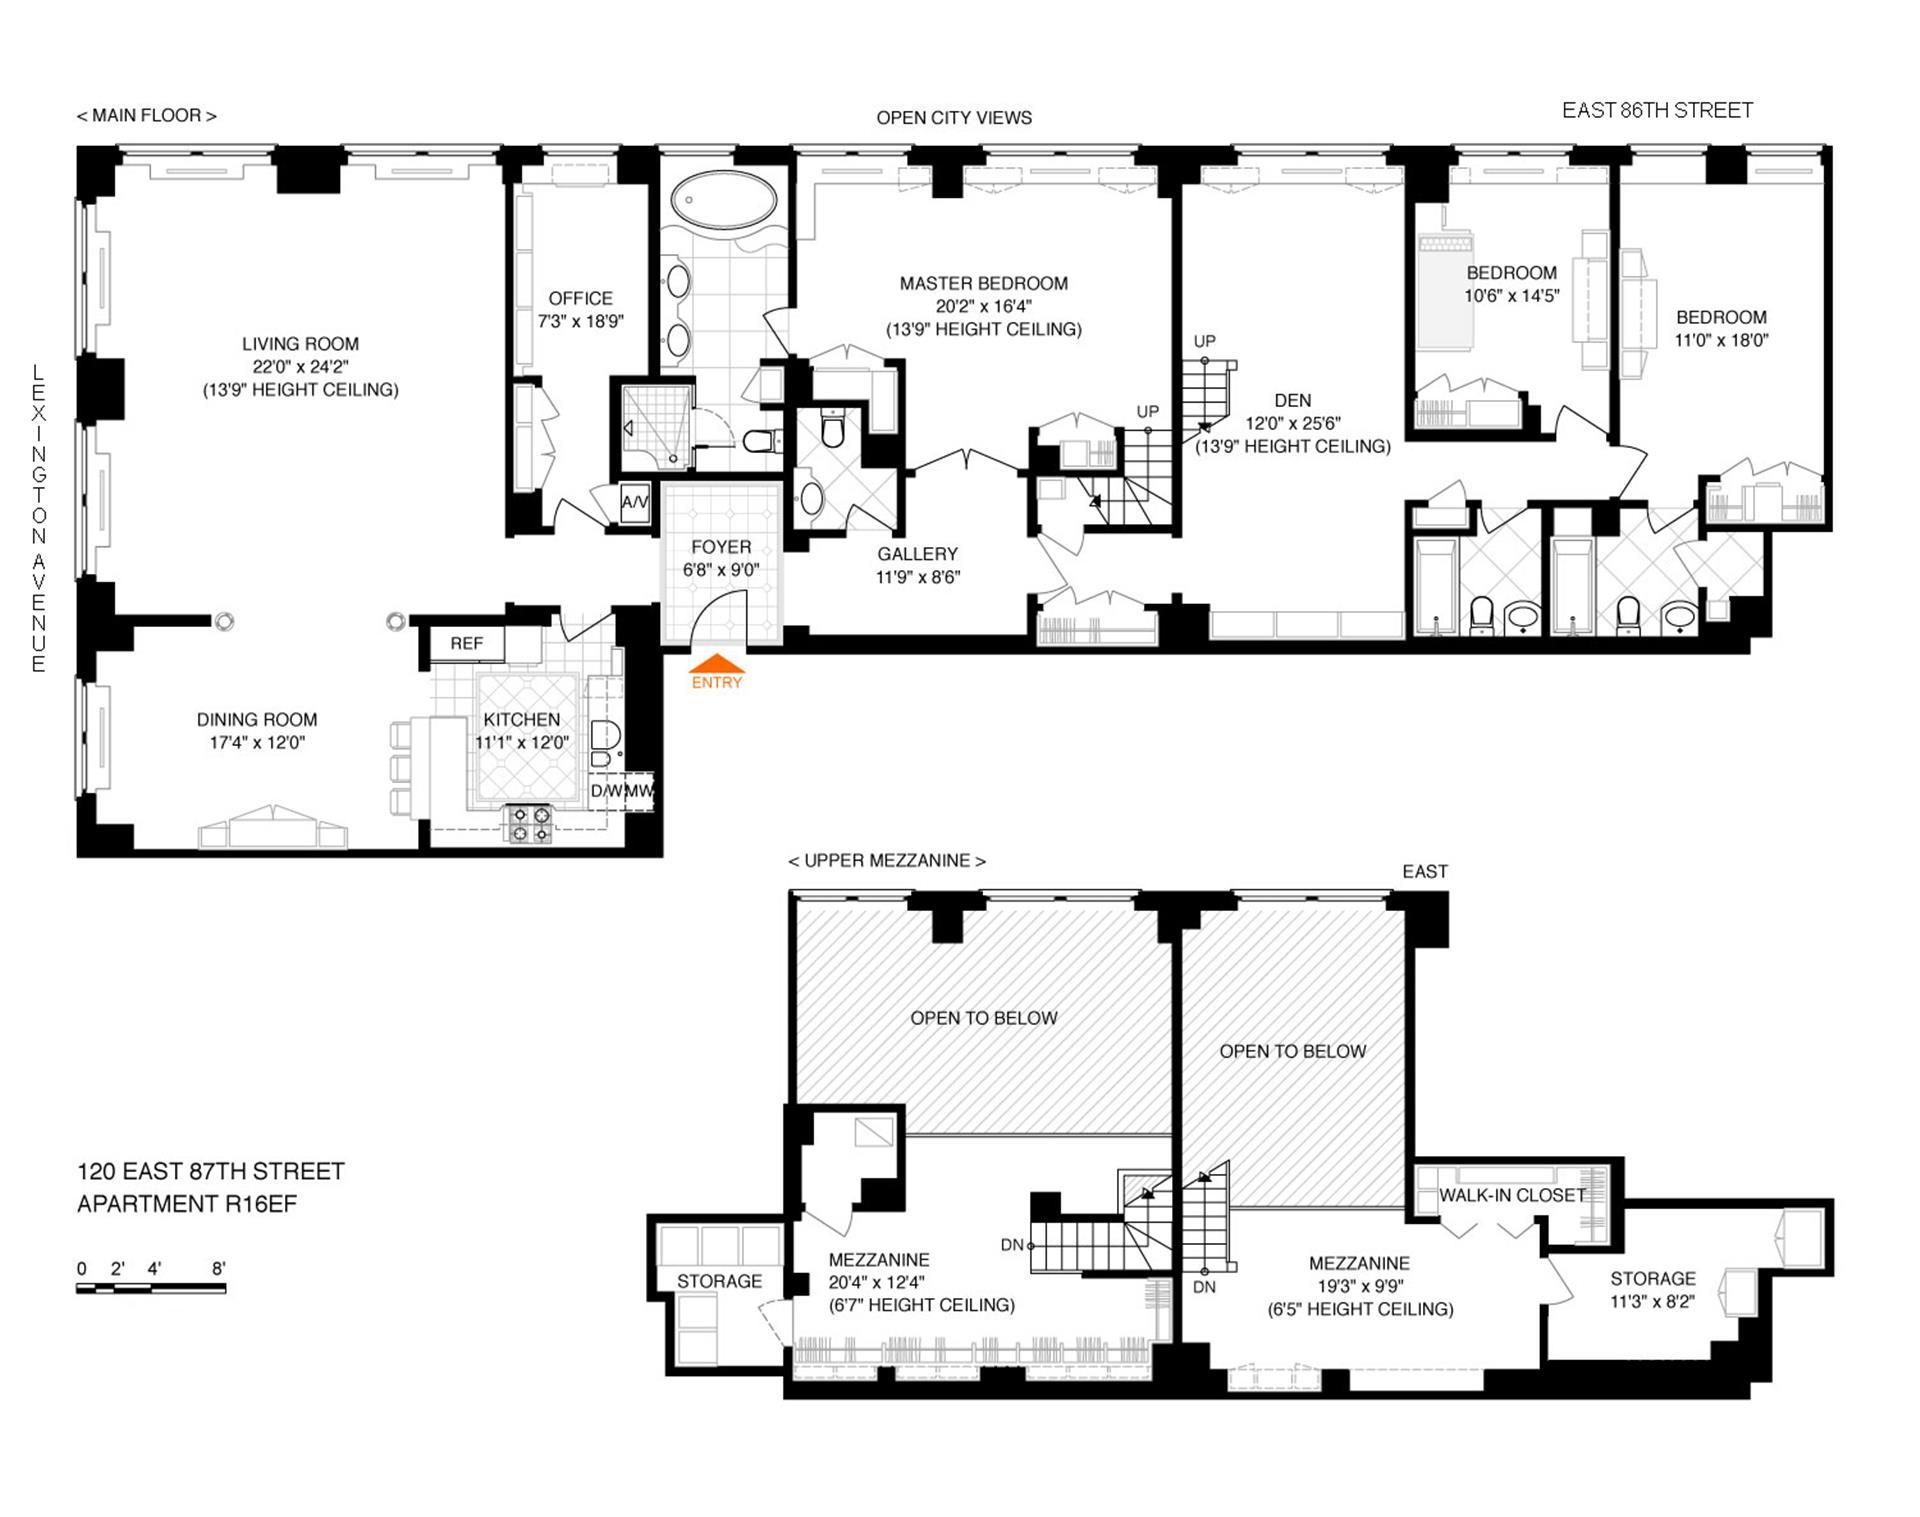 Floor plan of 120 East 87th St, R16EF - Carnegie Hill, New York